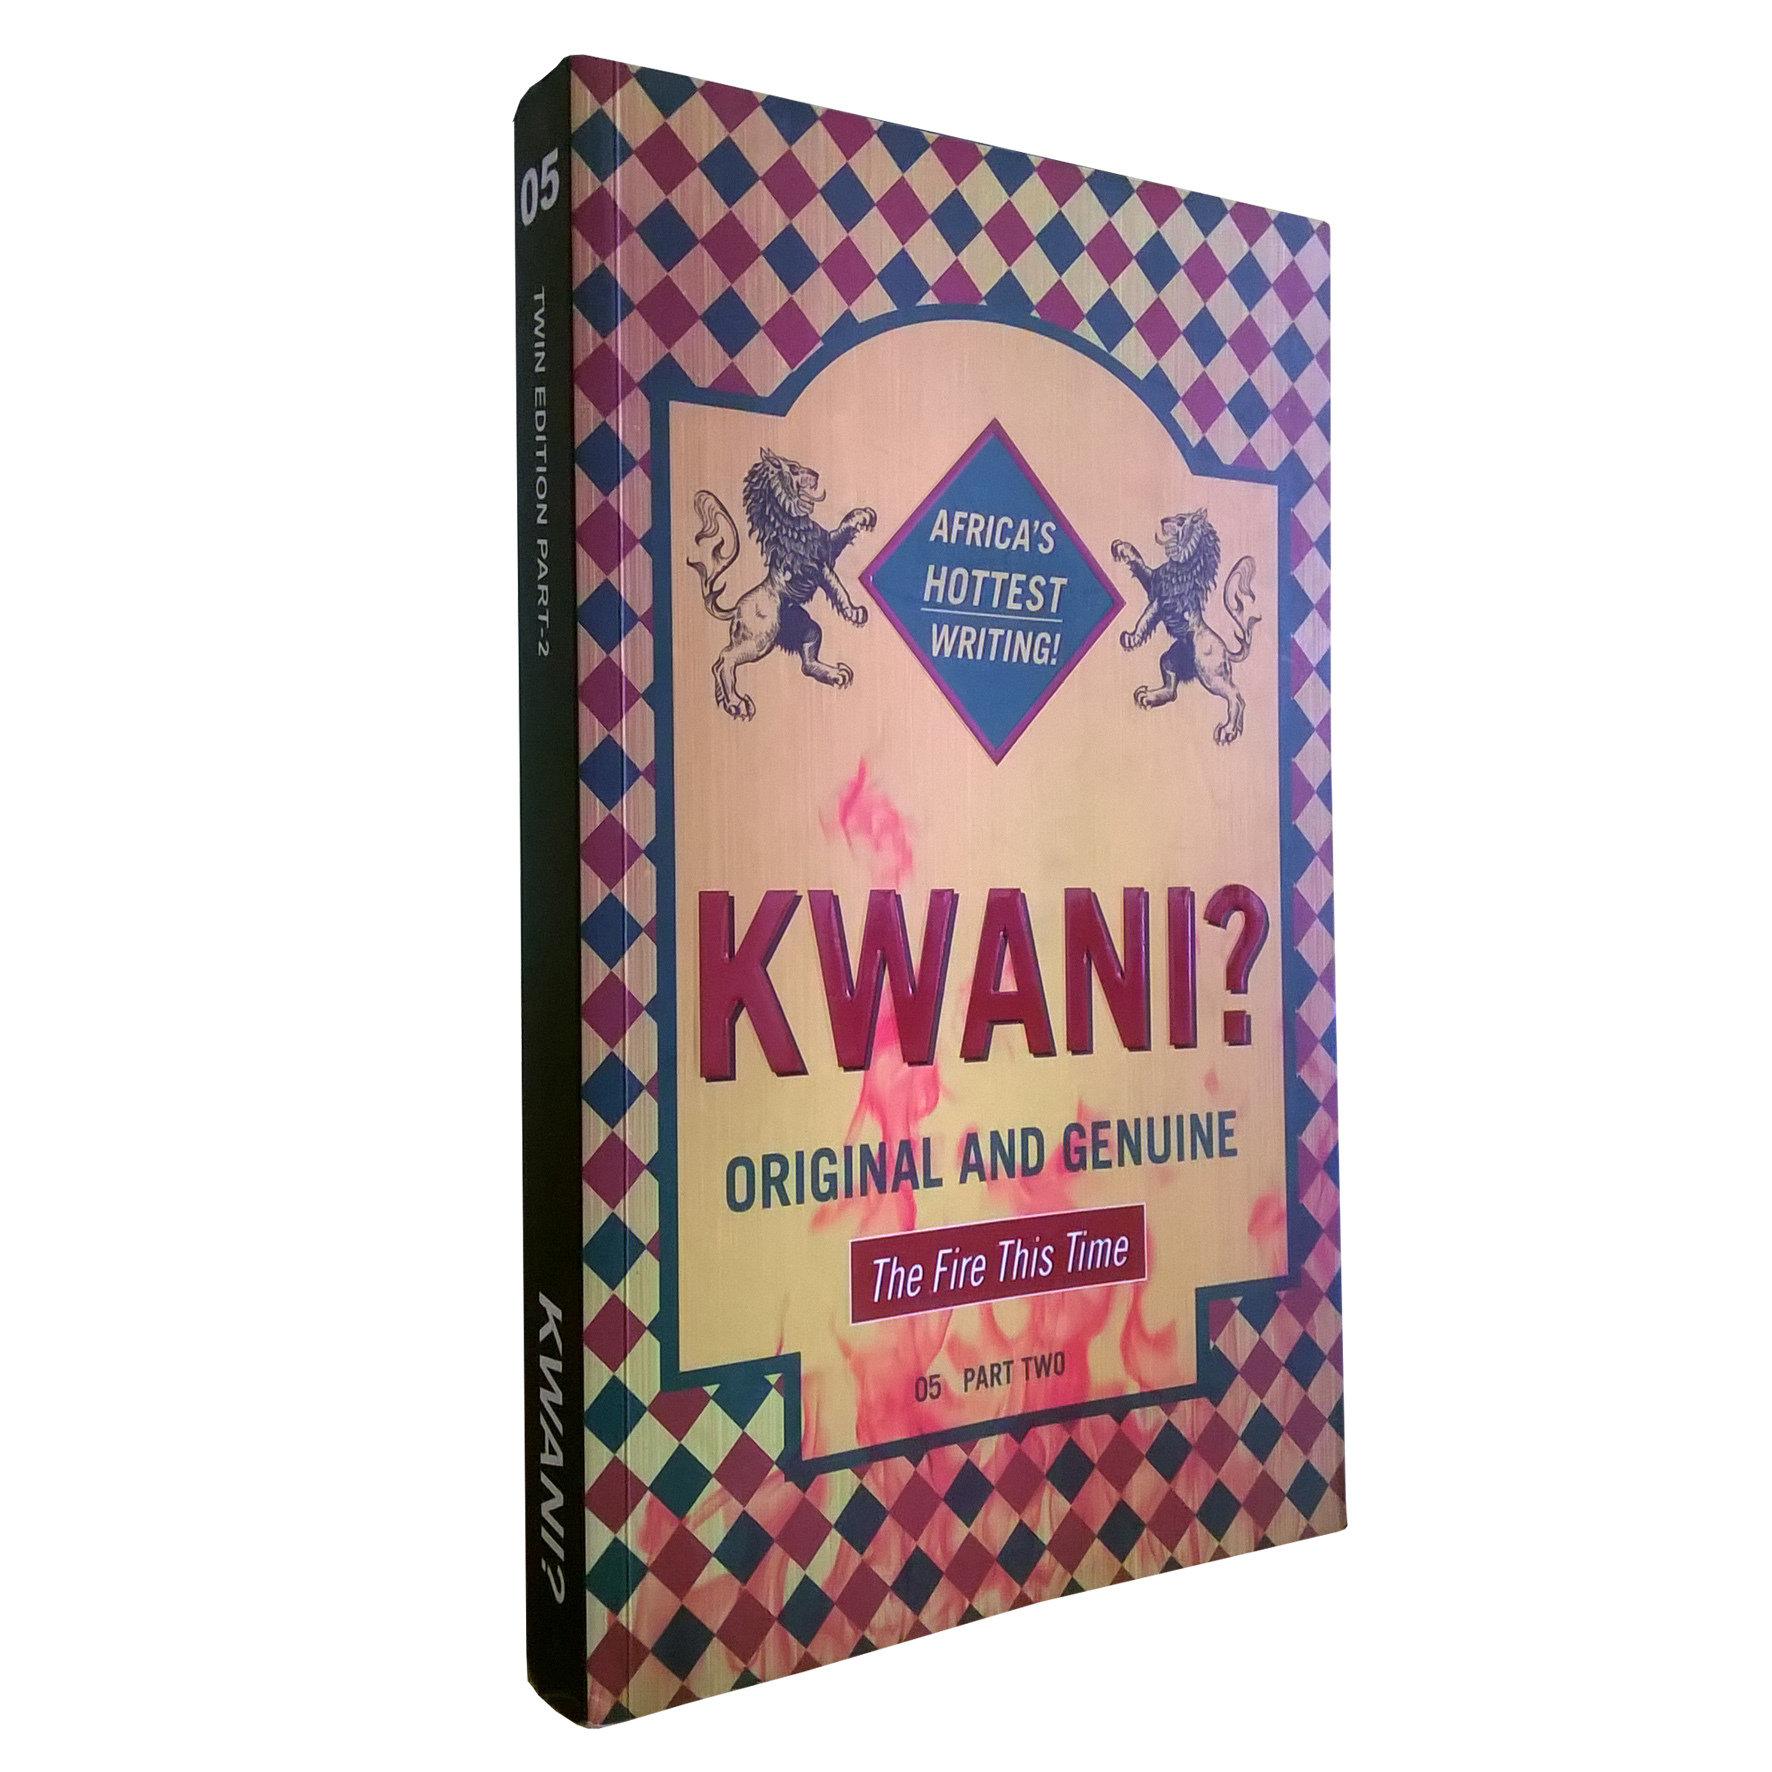 Kwani? Journal 5: Various Authors (Kwani? Trust, 2008) CIR12